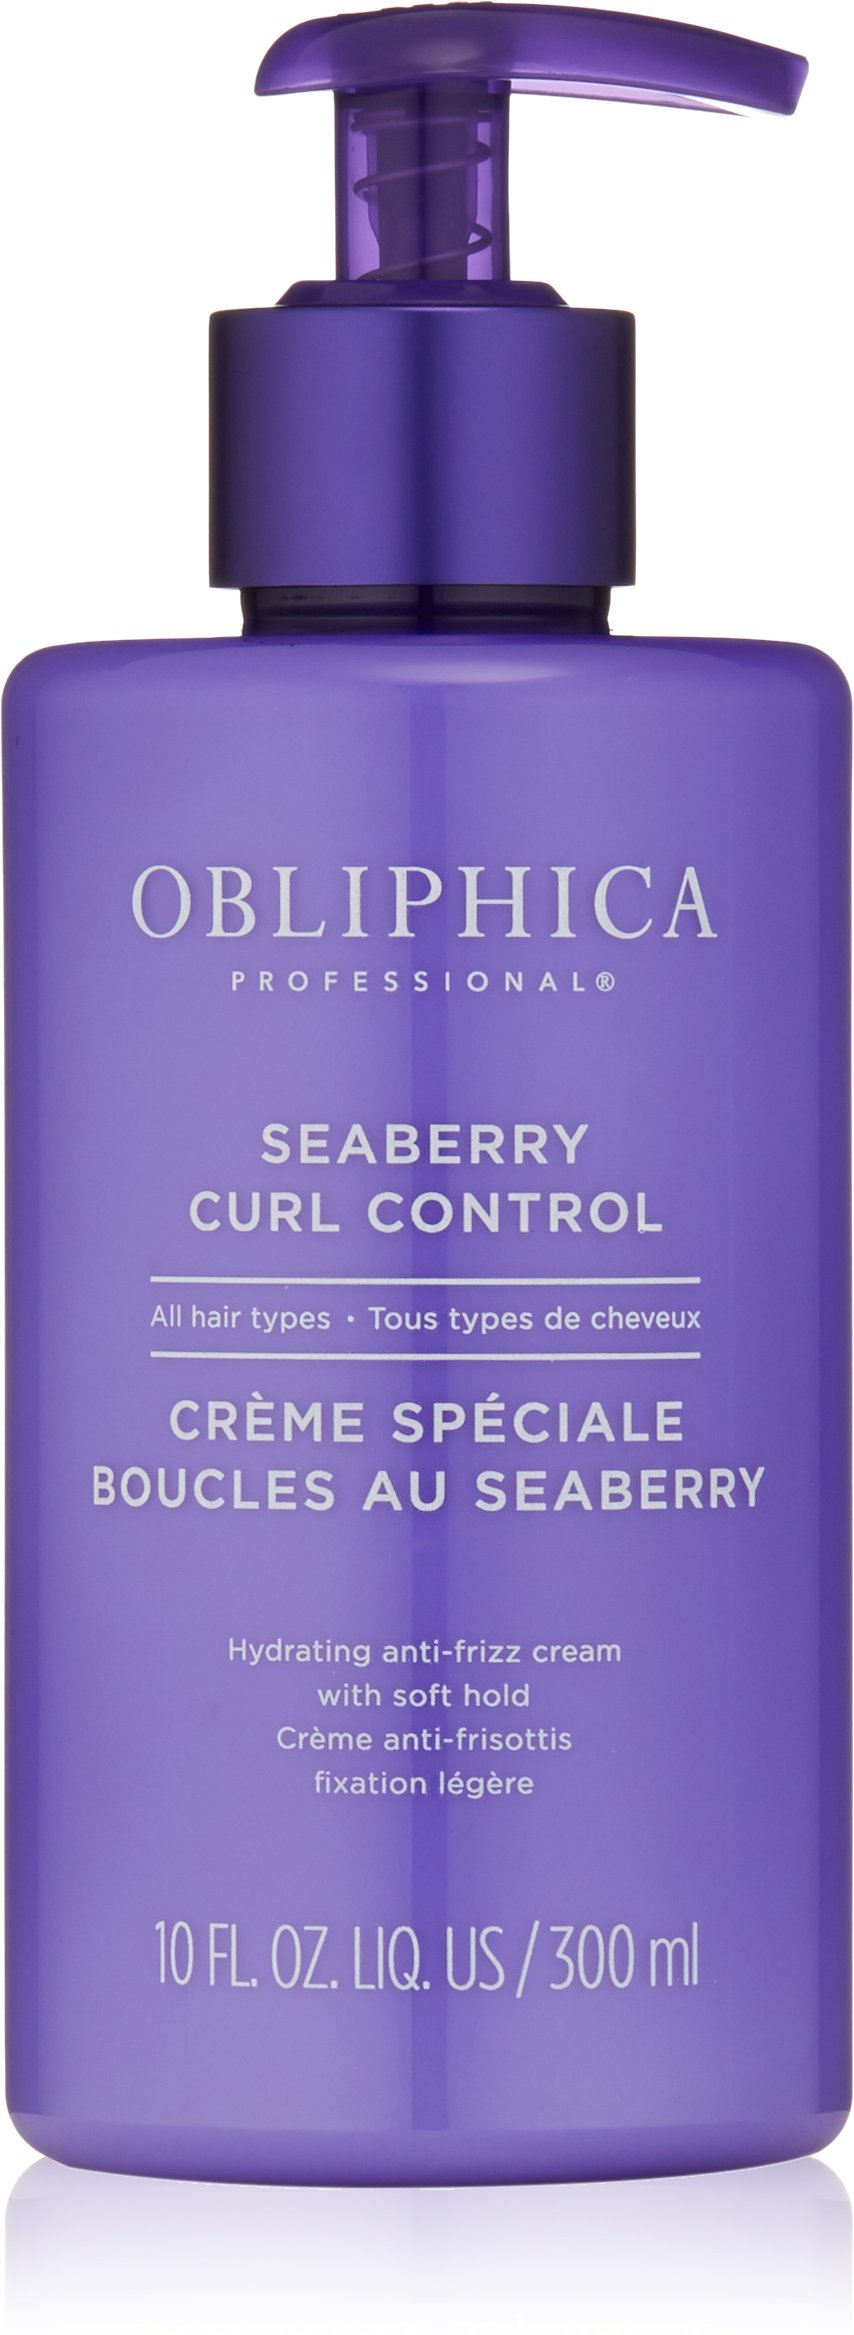 Obliphica Professional Seaberry Curl Control Cream, 10 fl. oz.